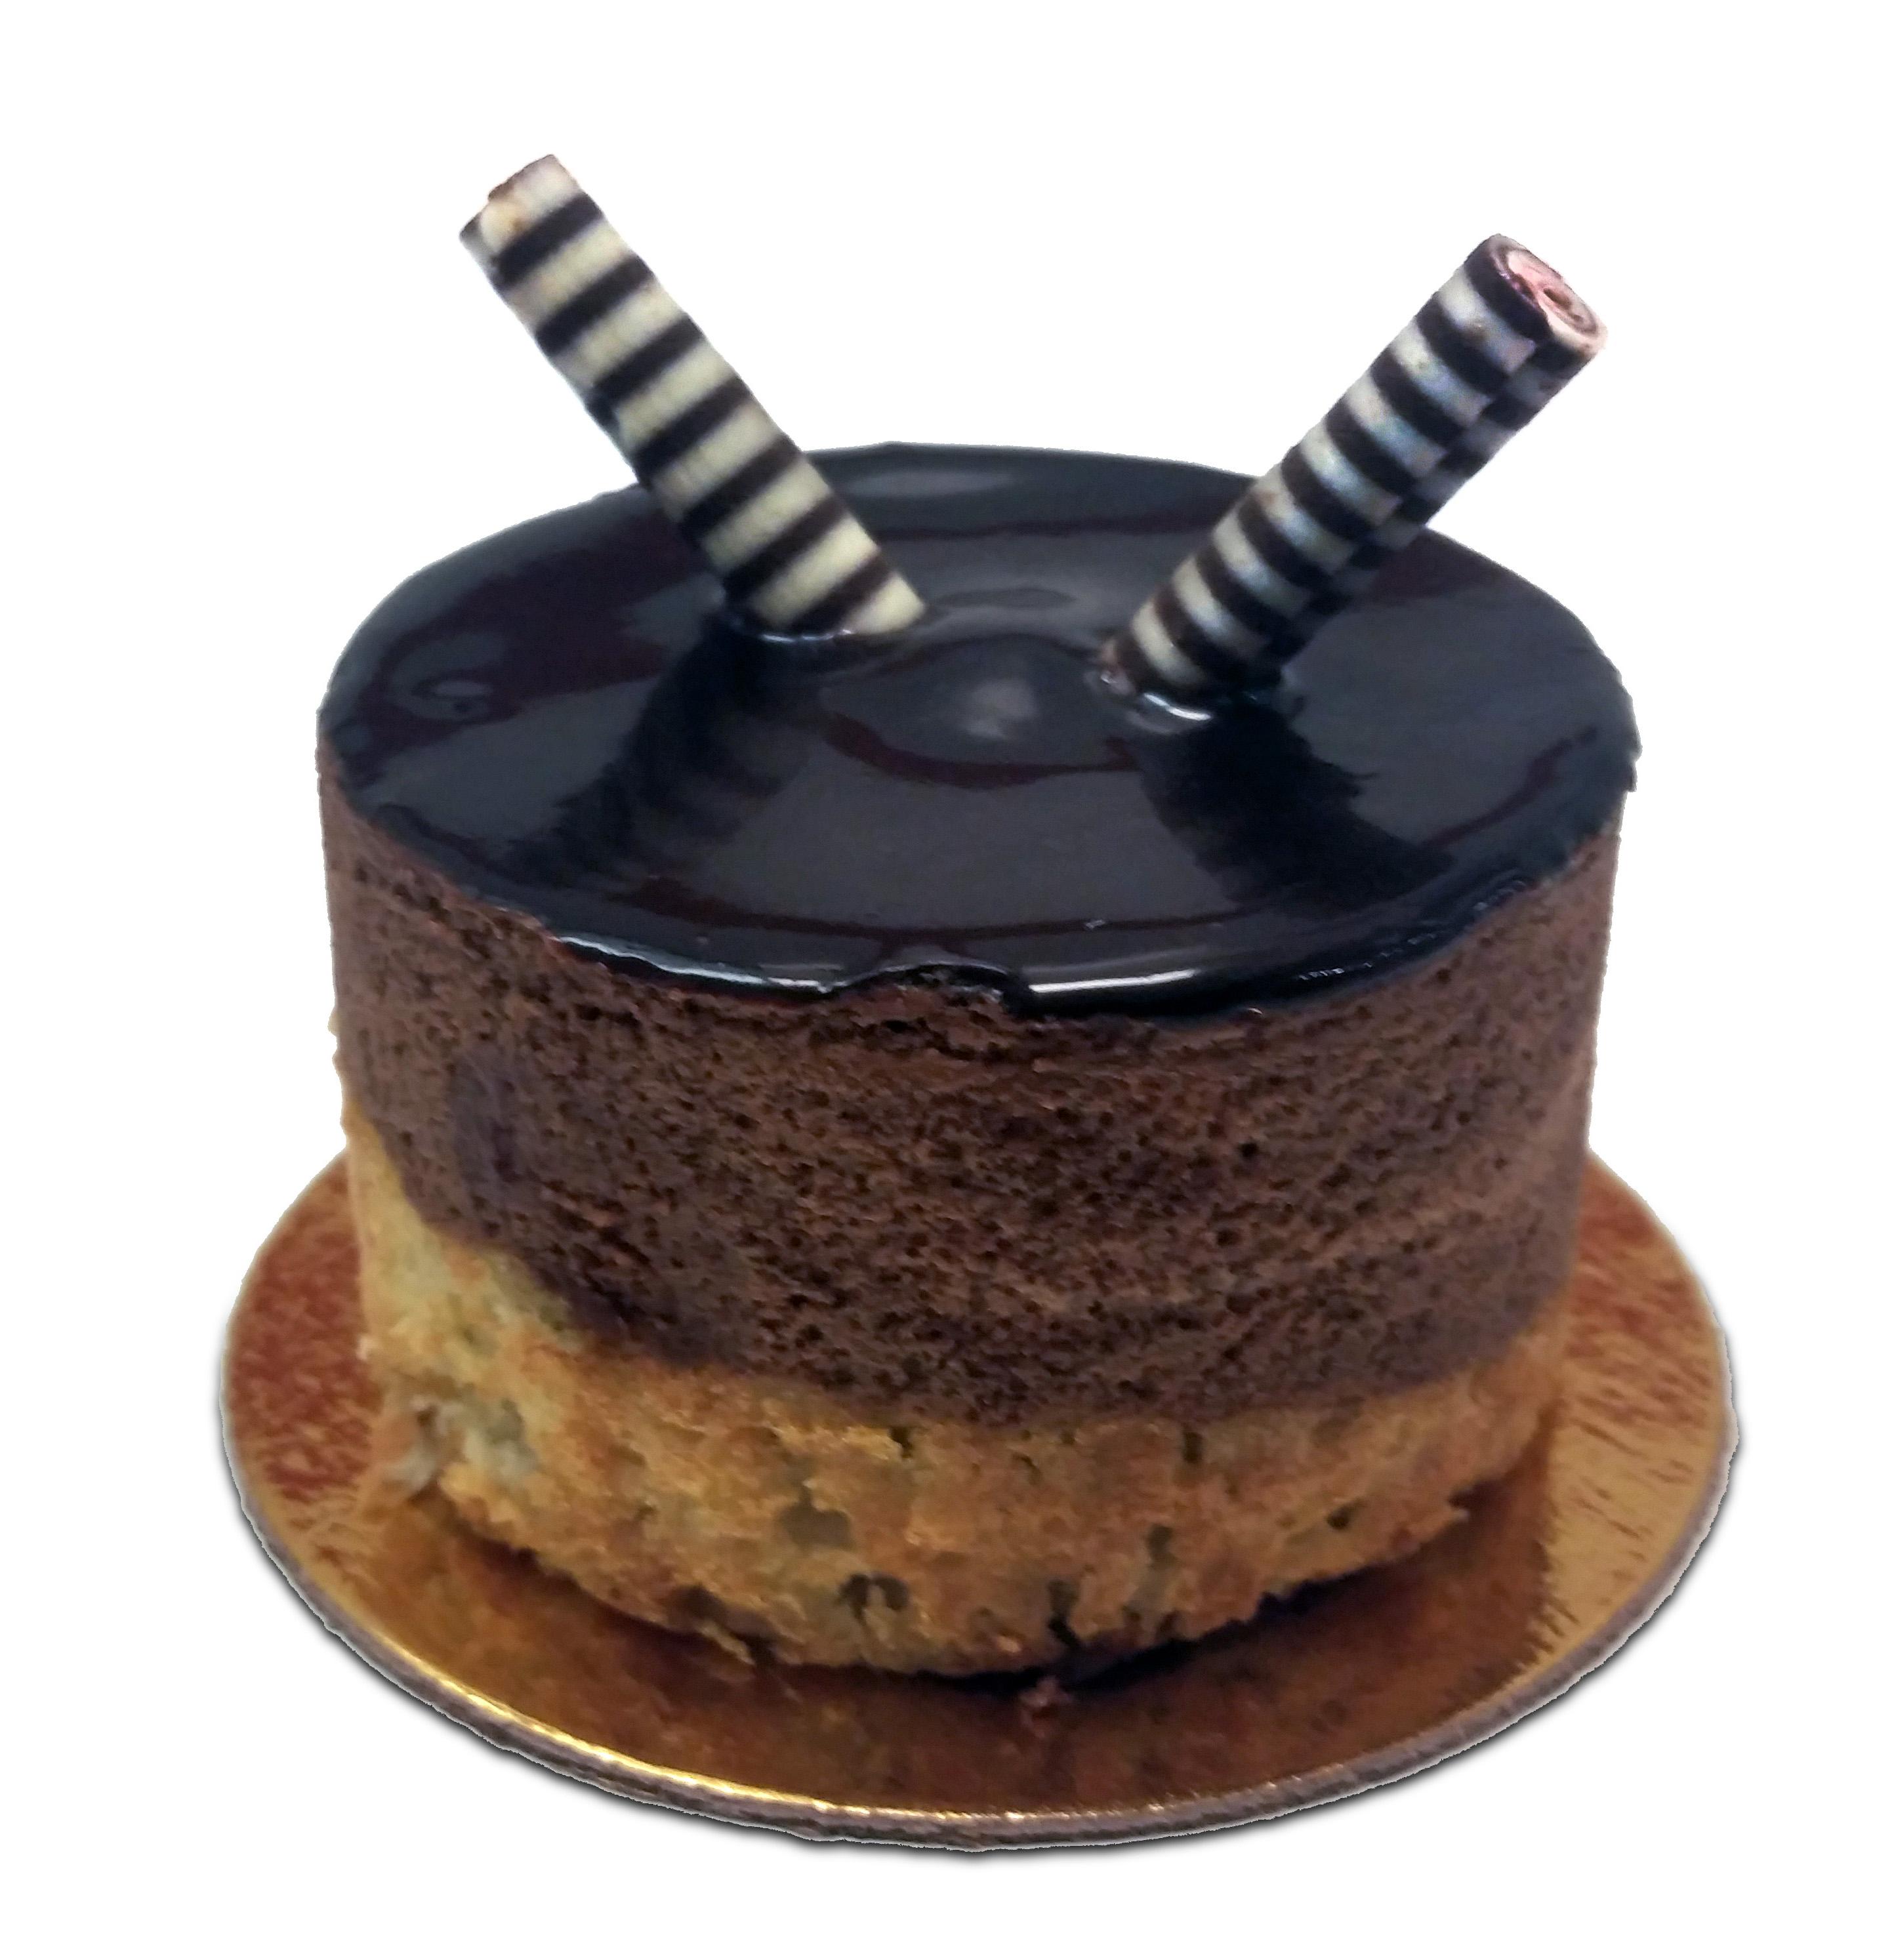 20170716_174742-chocolate-silo